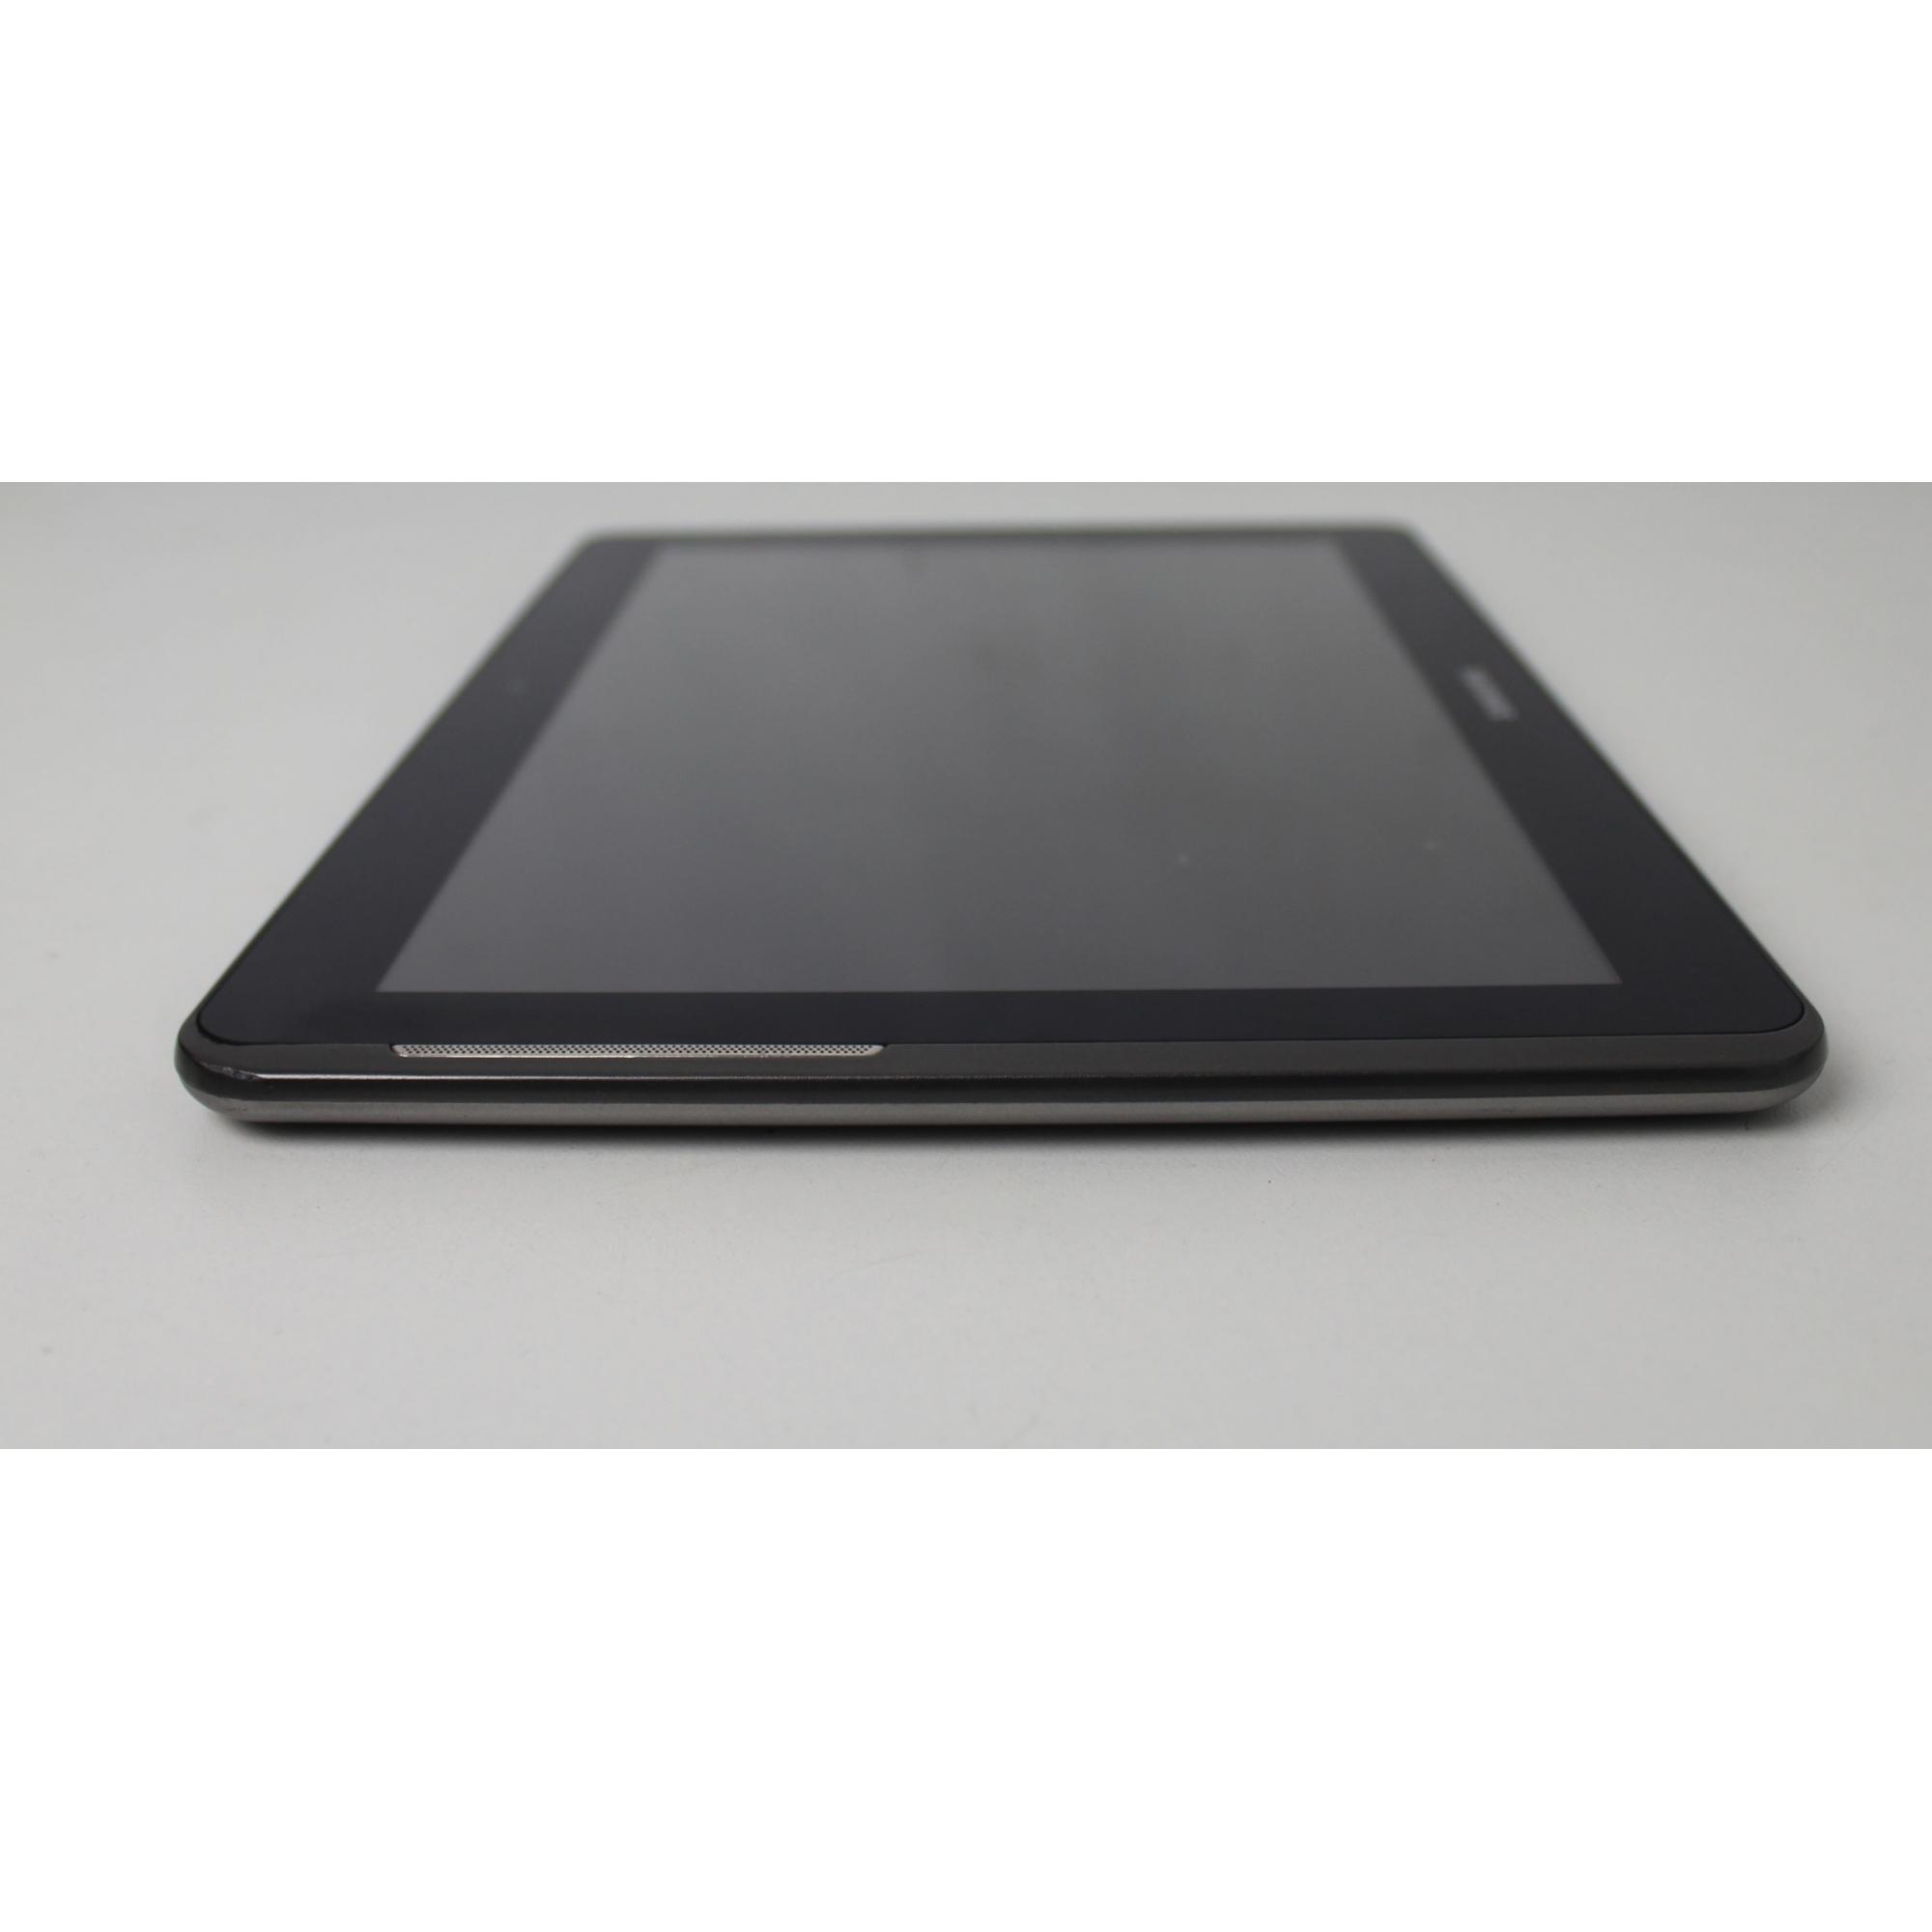 "TABLET SAMSUNG GALAXY TAB 2 GT-P5110 10.1"" 16GB - WIFI  (CINZA ESPACIAL)"